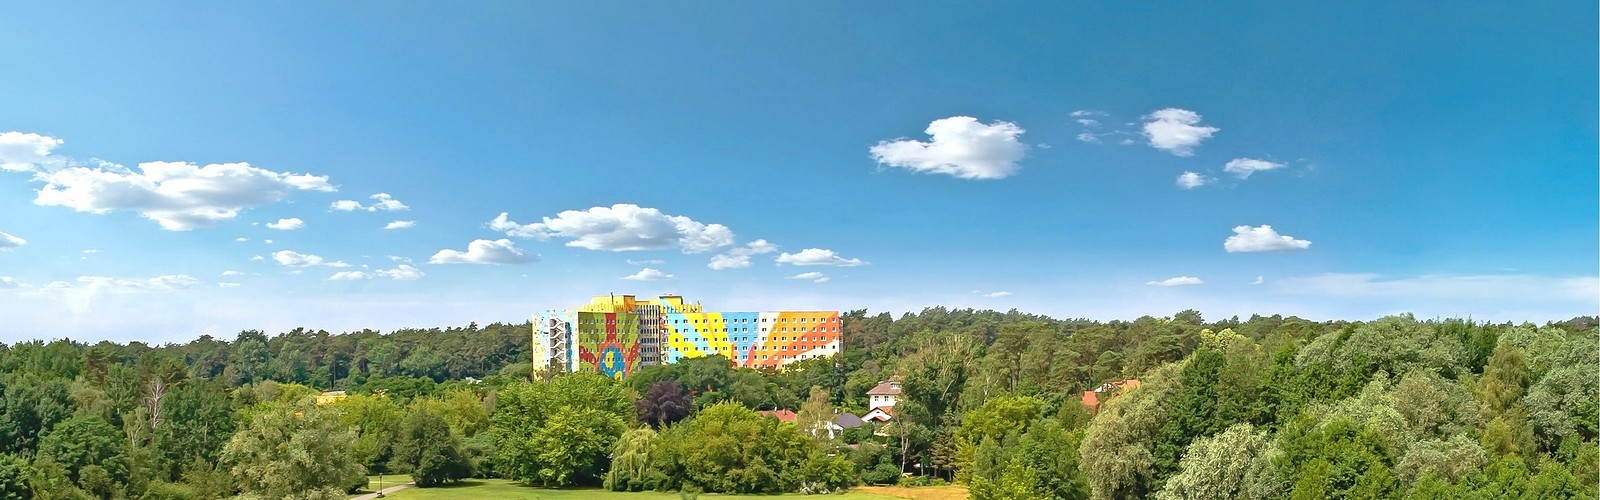 AHORN Seehotel Templin, Foto: AHORN Hotels & Resorts